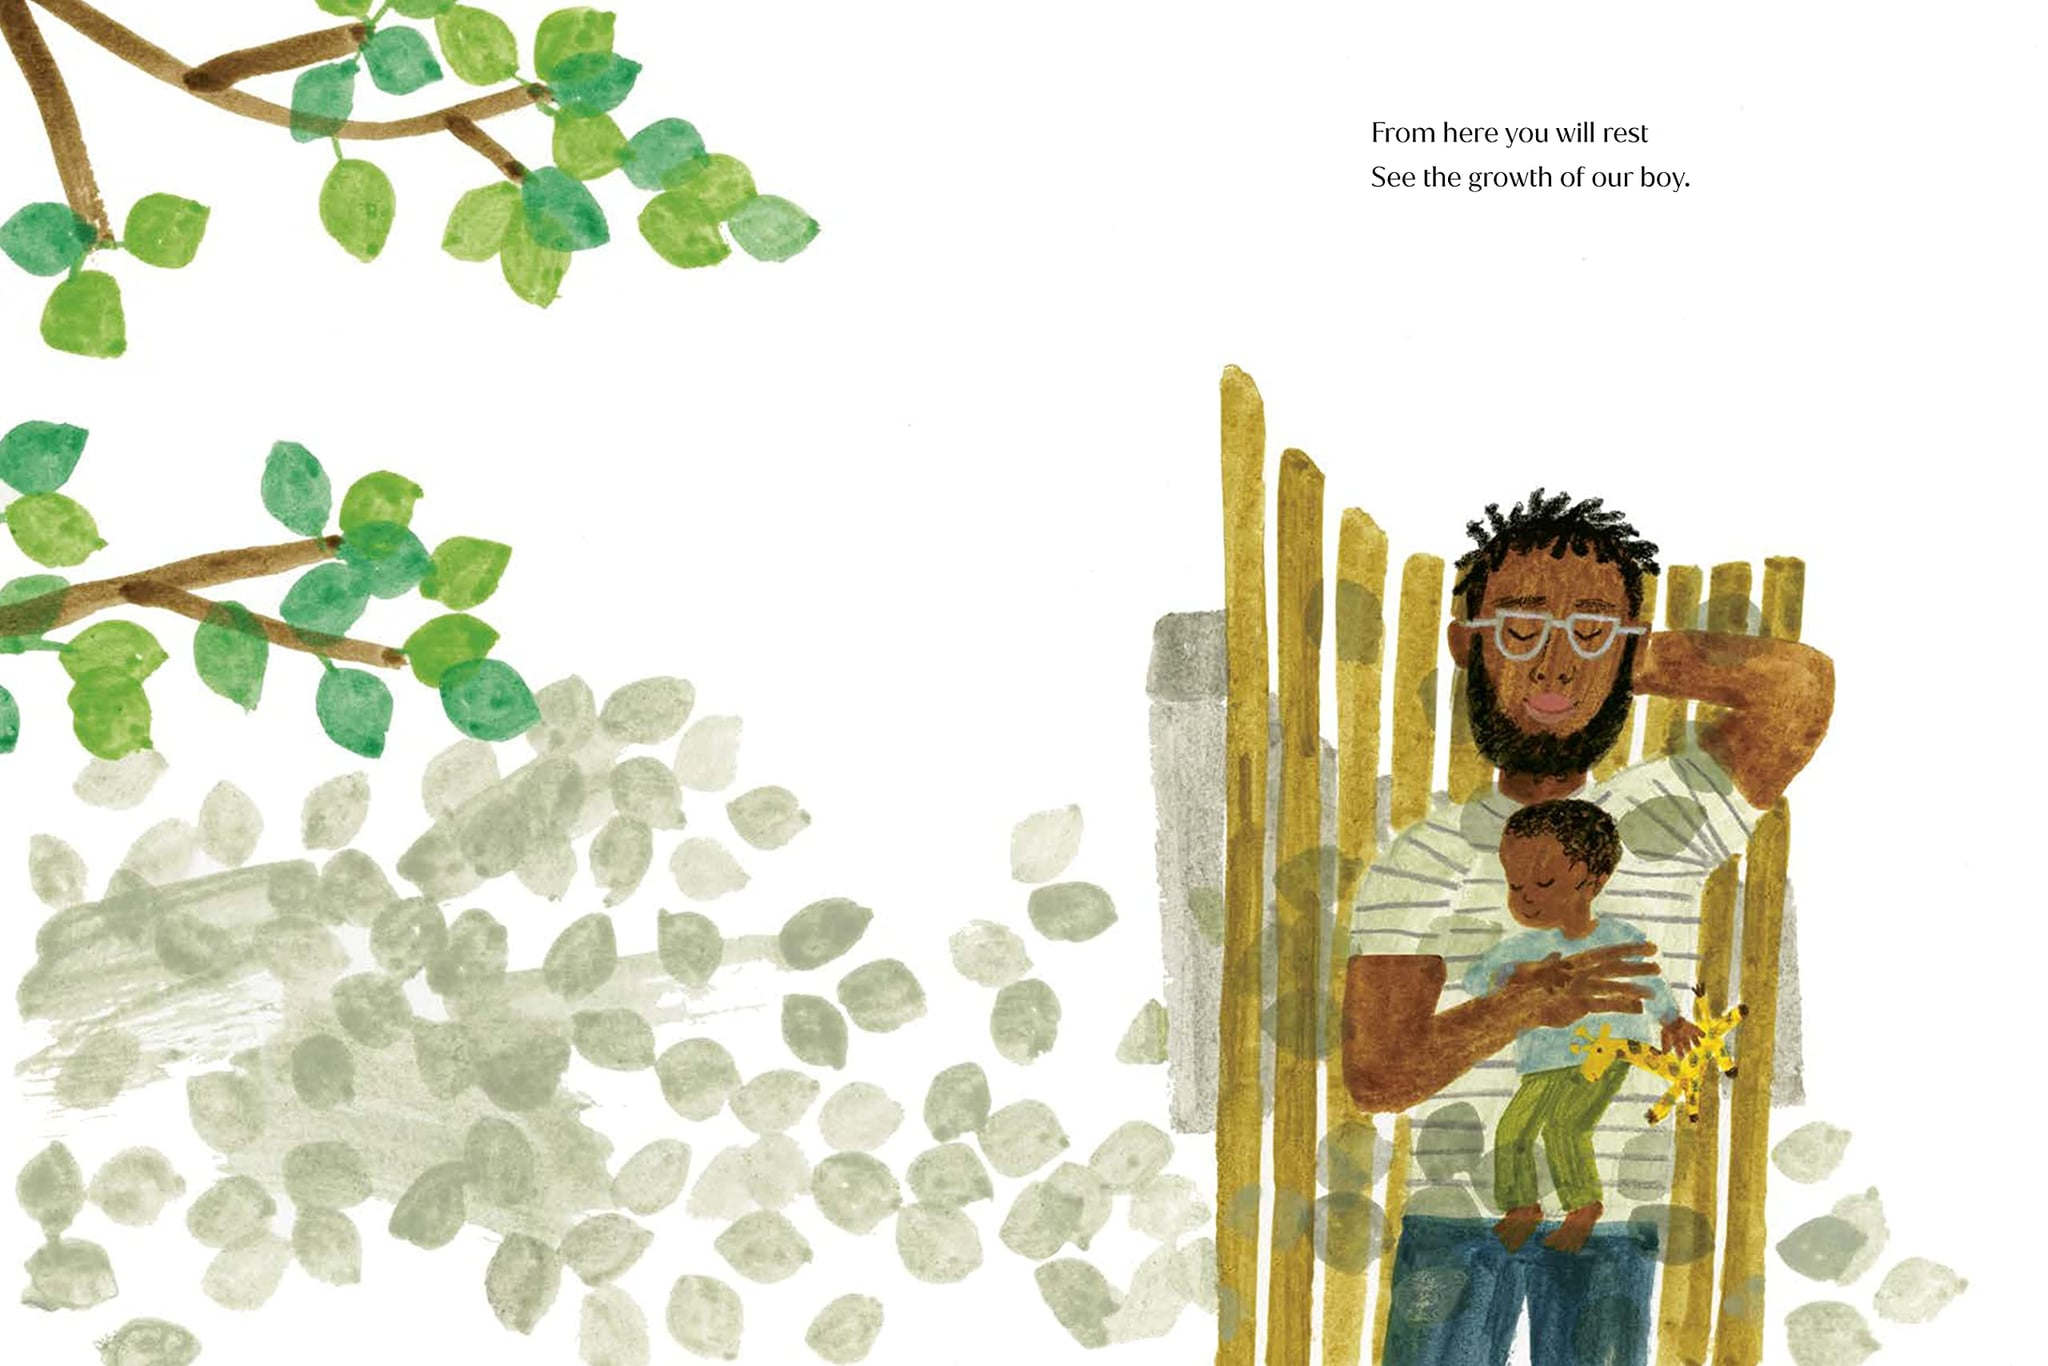 Meghan Markle Writes Her First Children's Book, The Bench | POPSUGAR Family